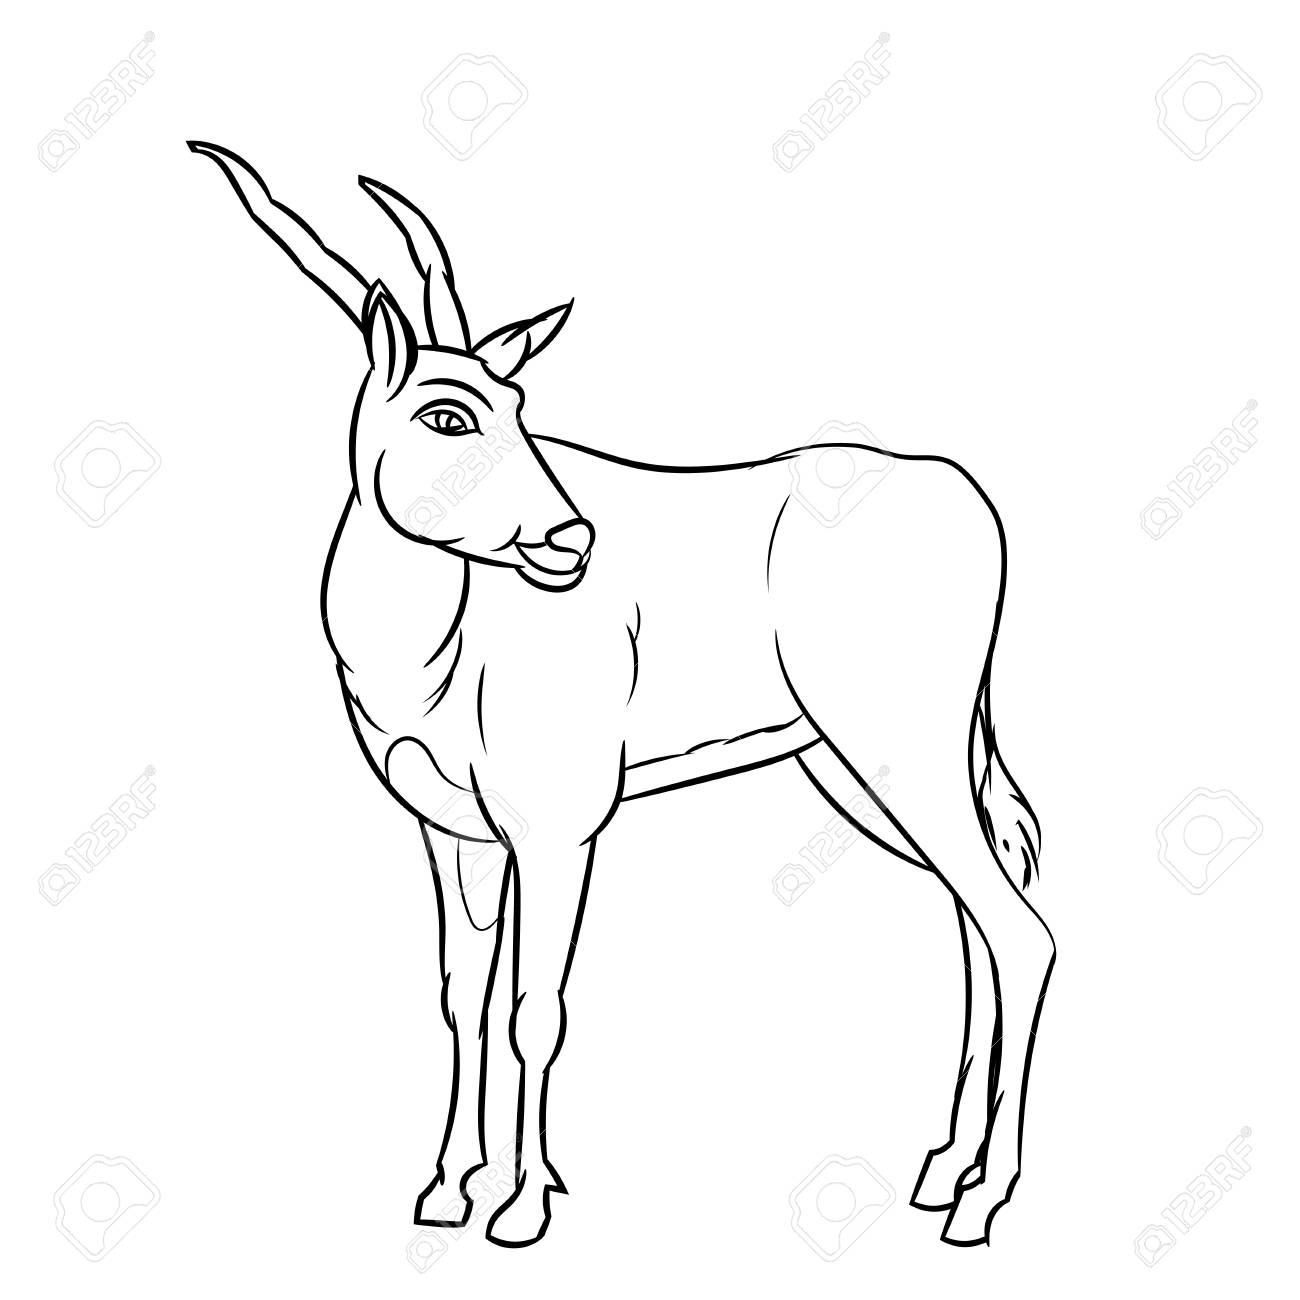 1300x1300 Hand Drawn Sketch Of Impala Deer Cartoon Isolated, Black